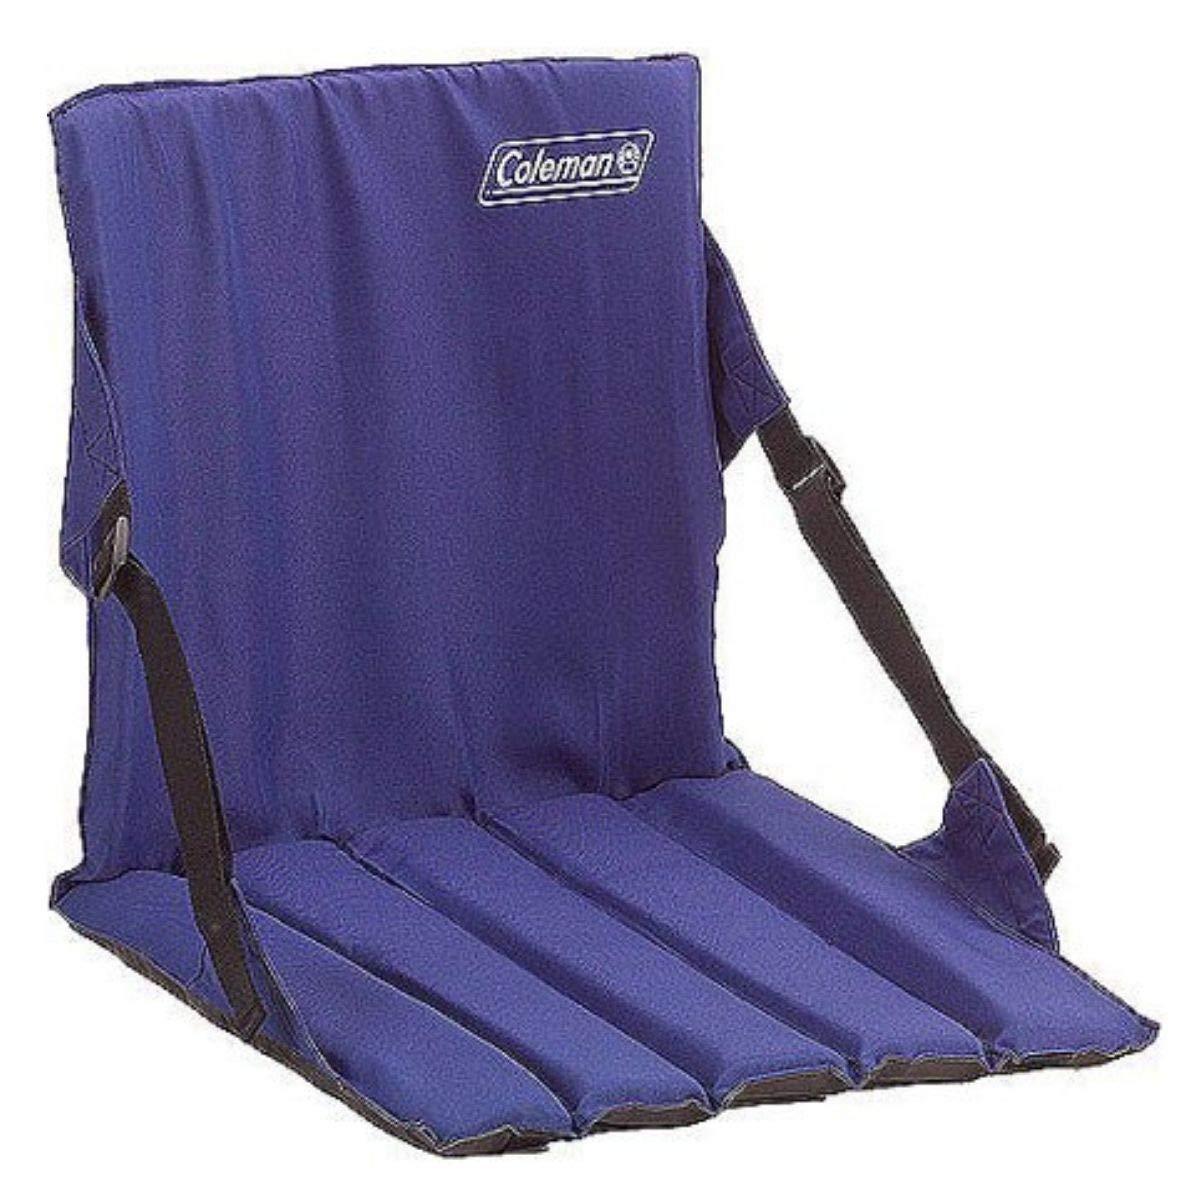 Coleman Portable Stadium Seat Padded Cushion with Backrest (Blue/Set of 2)